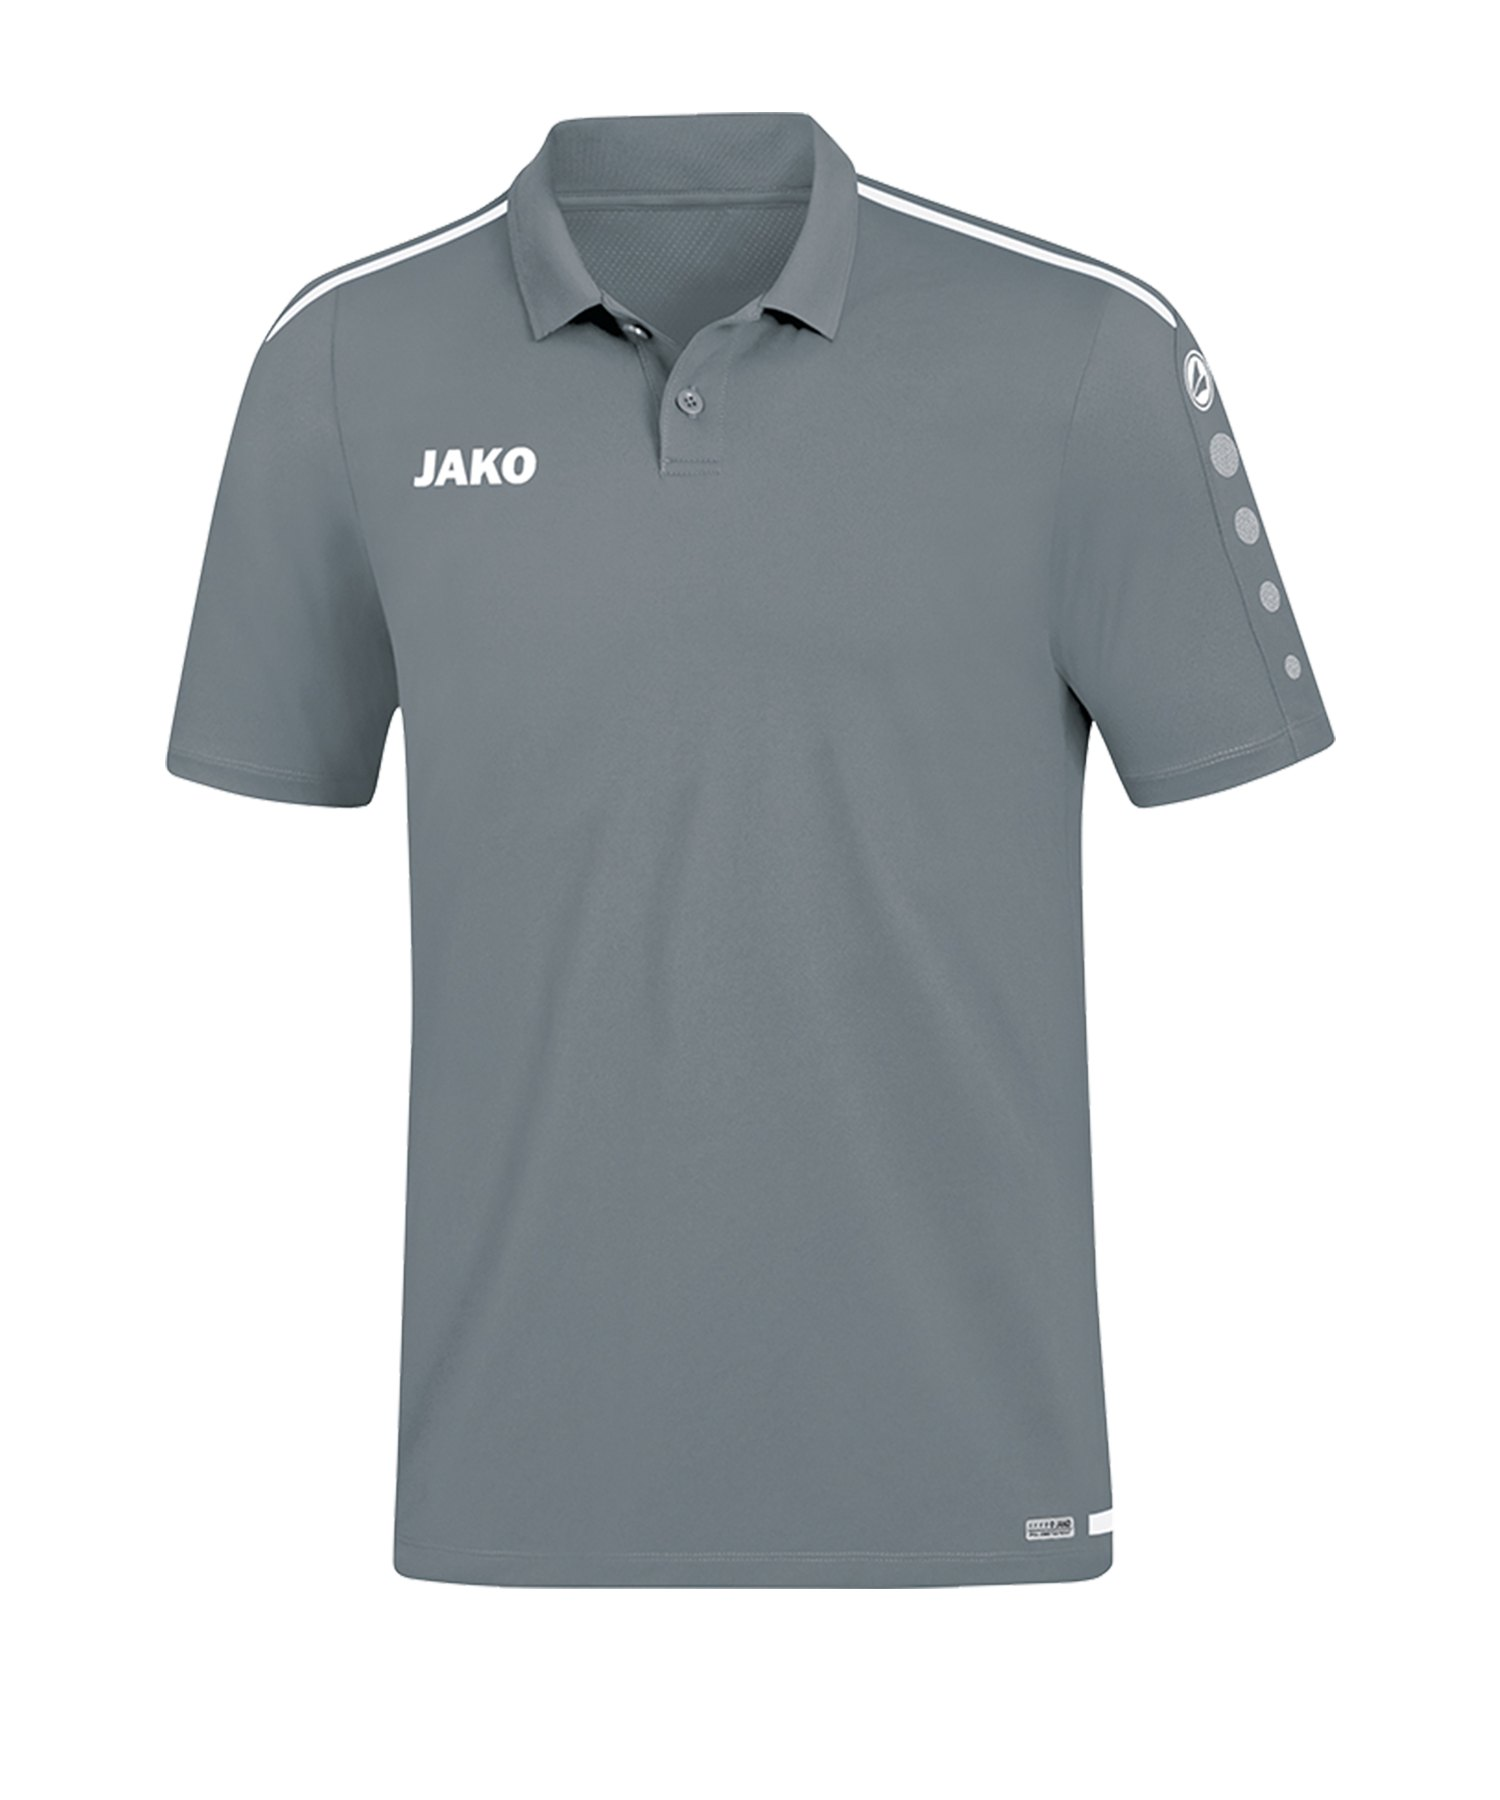 Jako Striker 2.0 Poloshirt Grau Weiss F40 - Grau